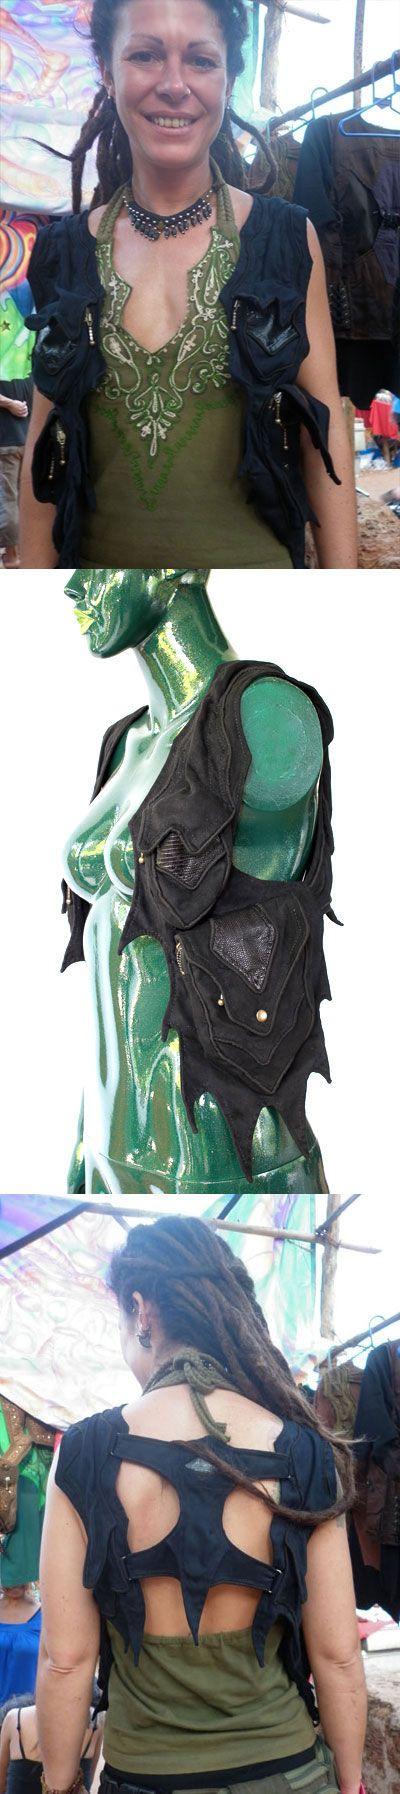 burning man festival fashion playa wear Goa style holster apocalypse women